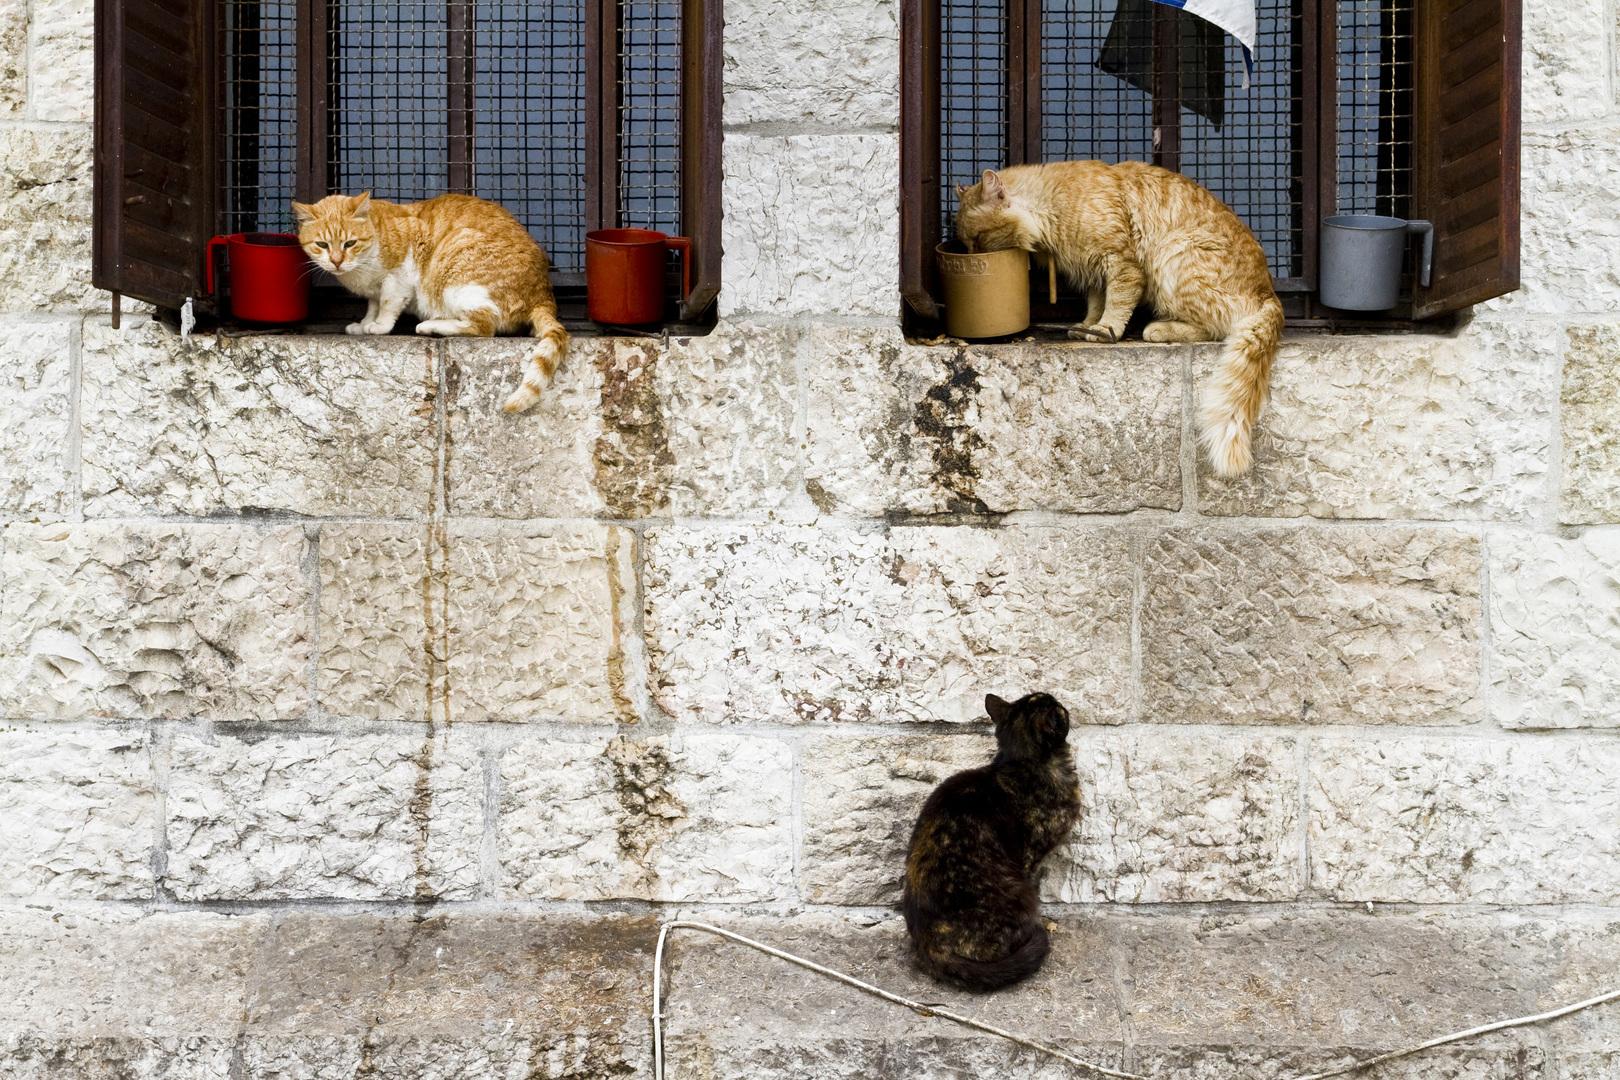 Jerusalem, Israel. 2010.